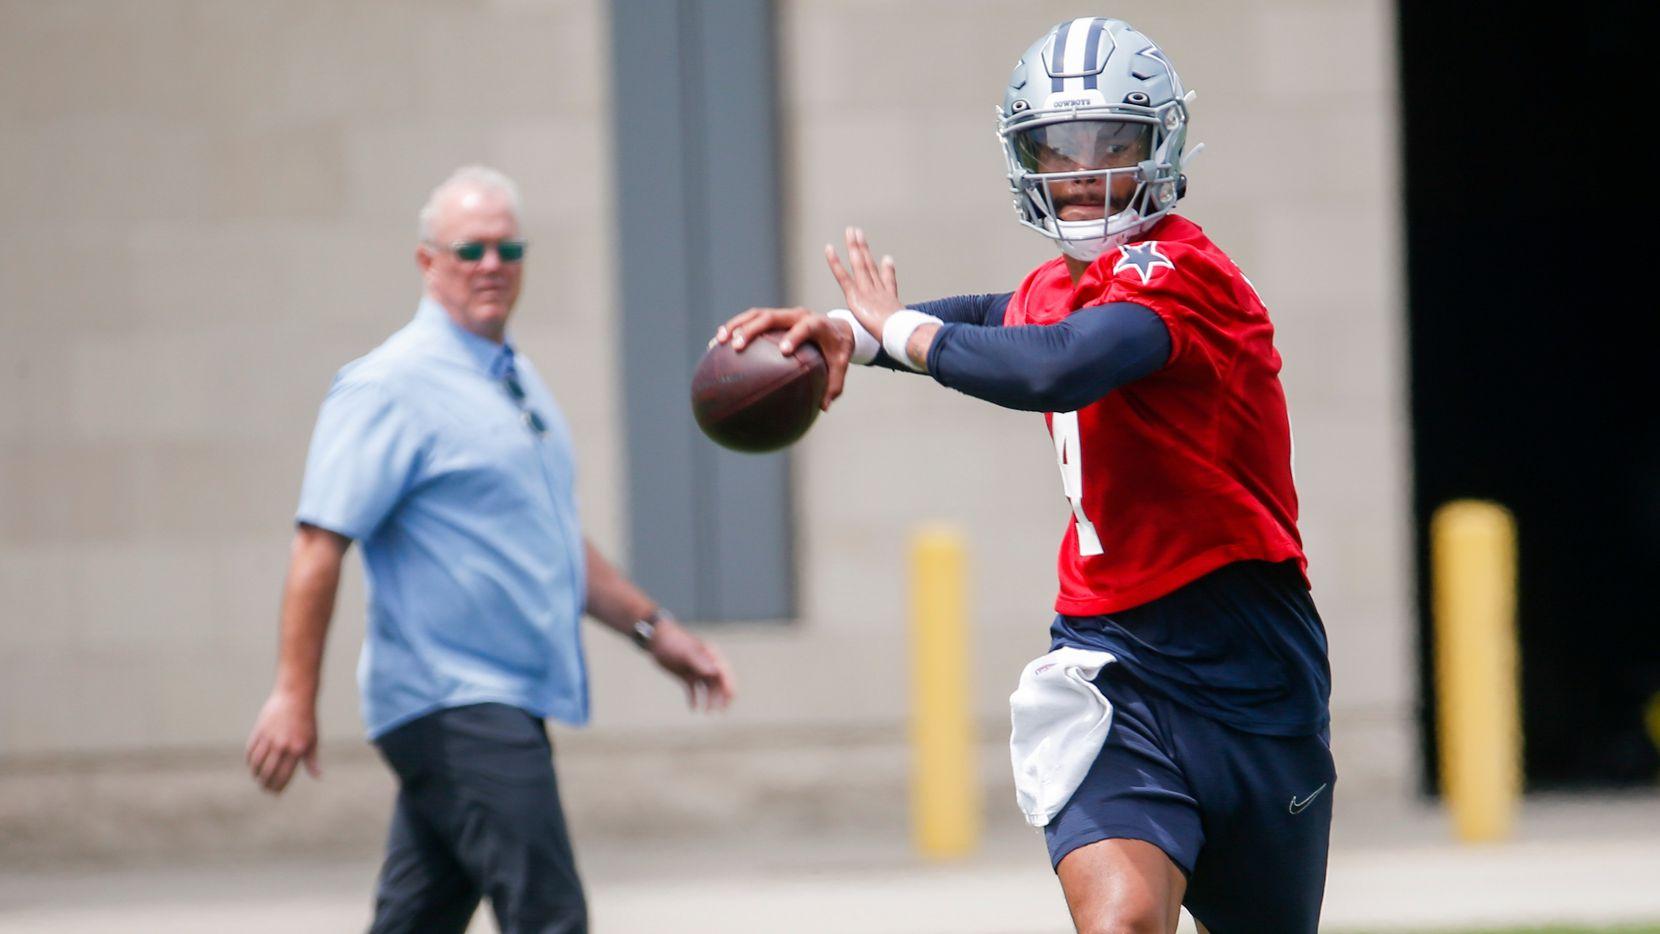 Dallas Cowboys CEO Stephen Jones watches as Dallas Cowboys quarterback Dak Prescott (4) practices during the Cowboys second OTA practice on Thursday, June 3, 2021, at the Star in Frisco.